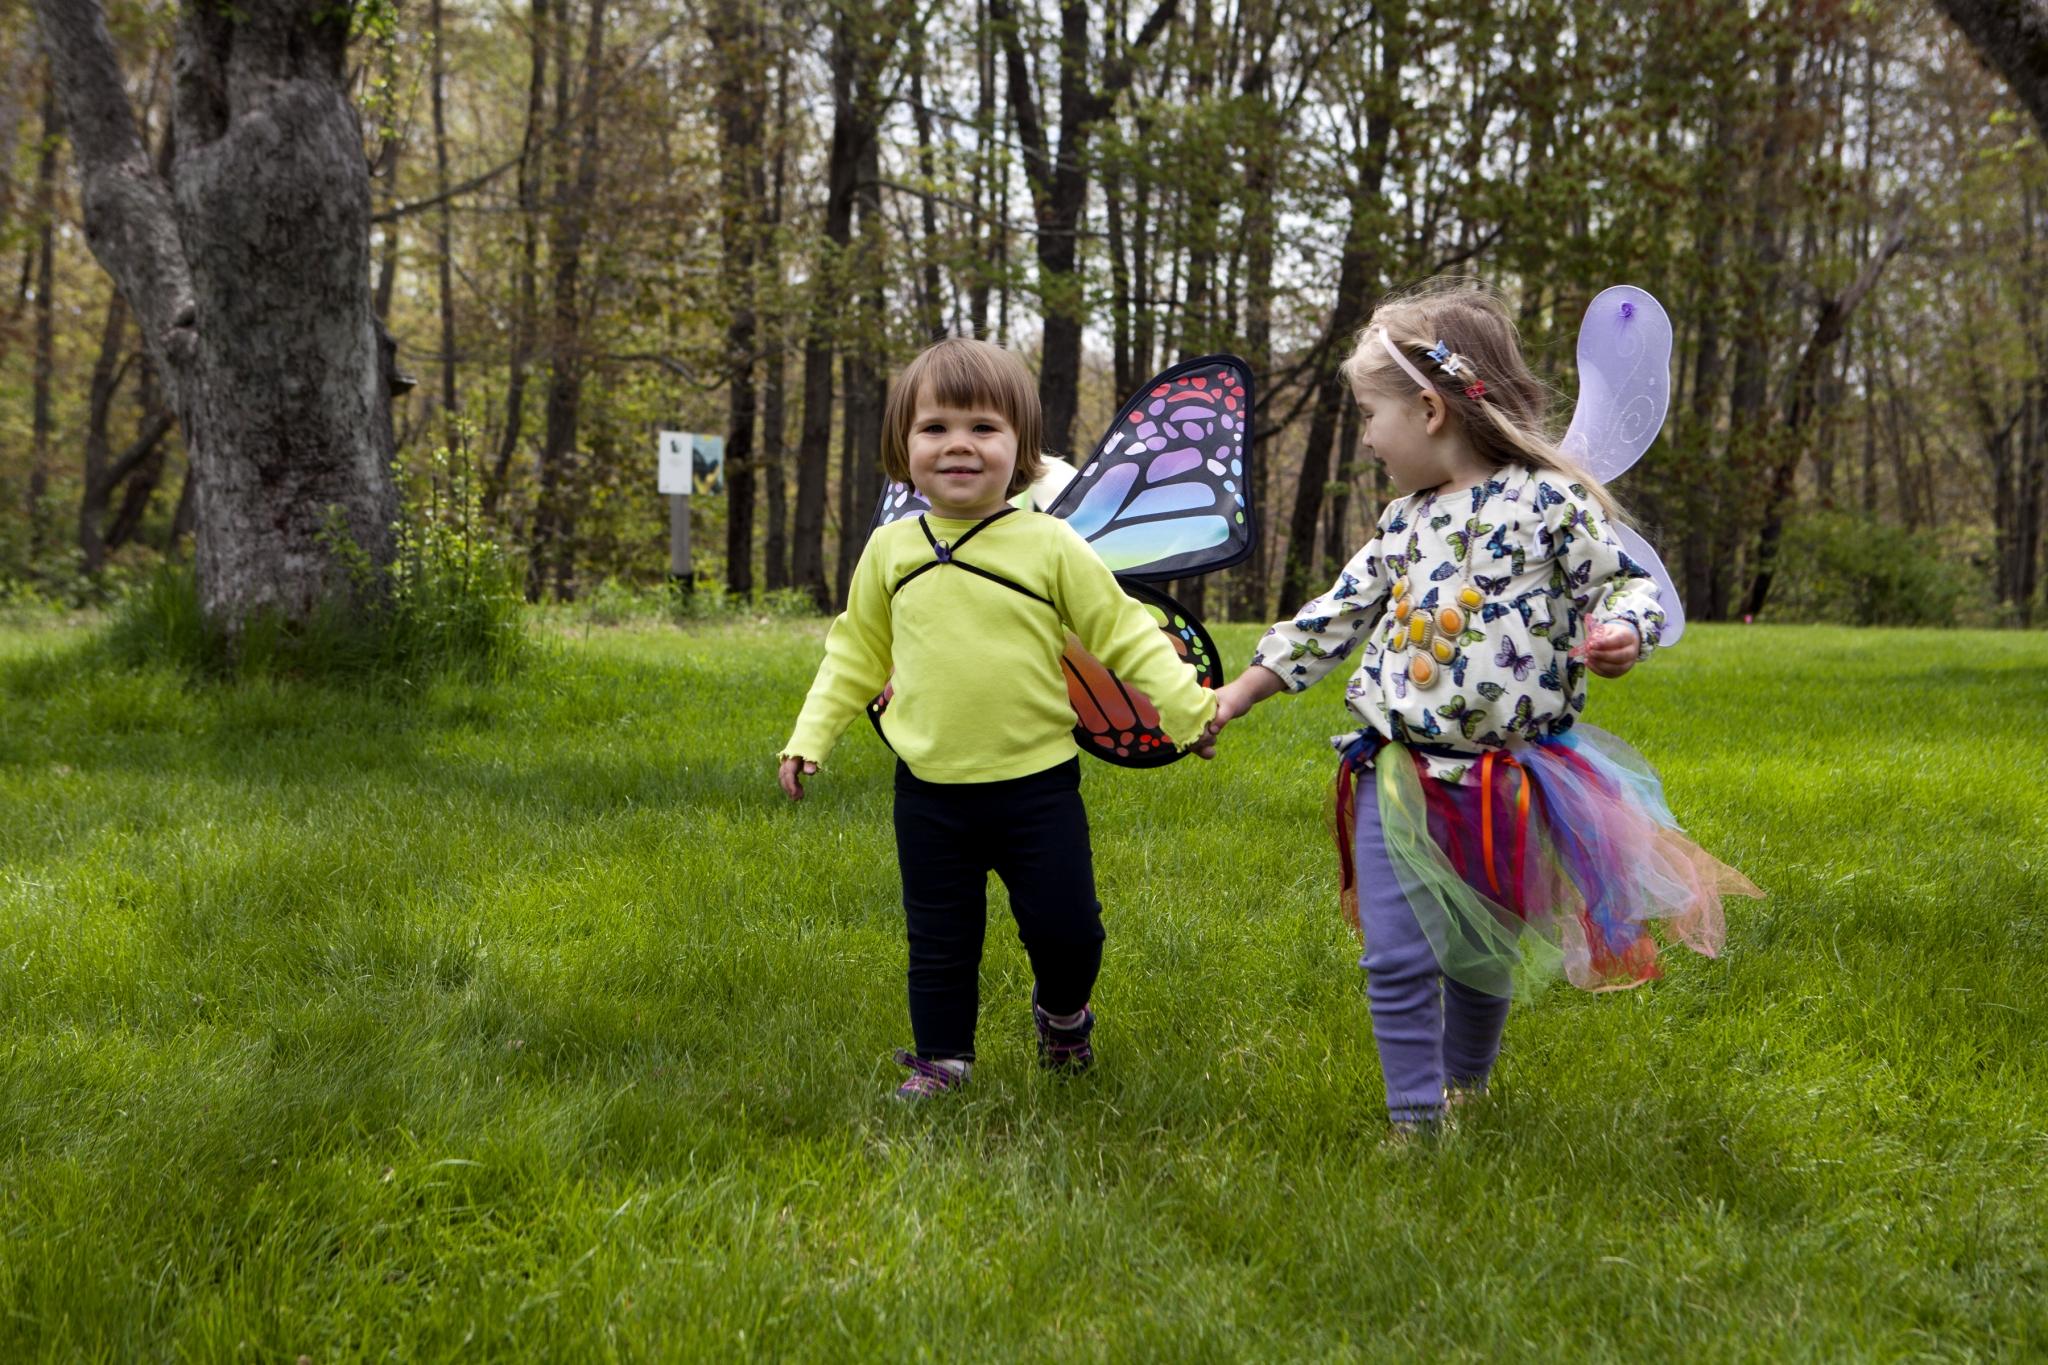 Pollinator Parade and Festival